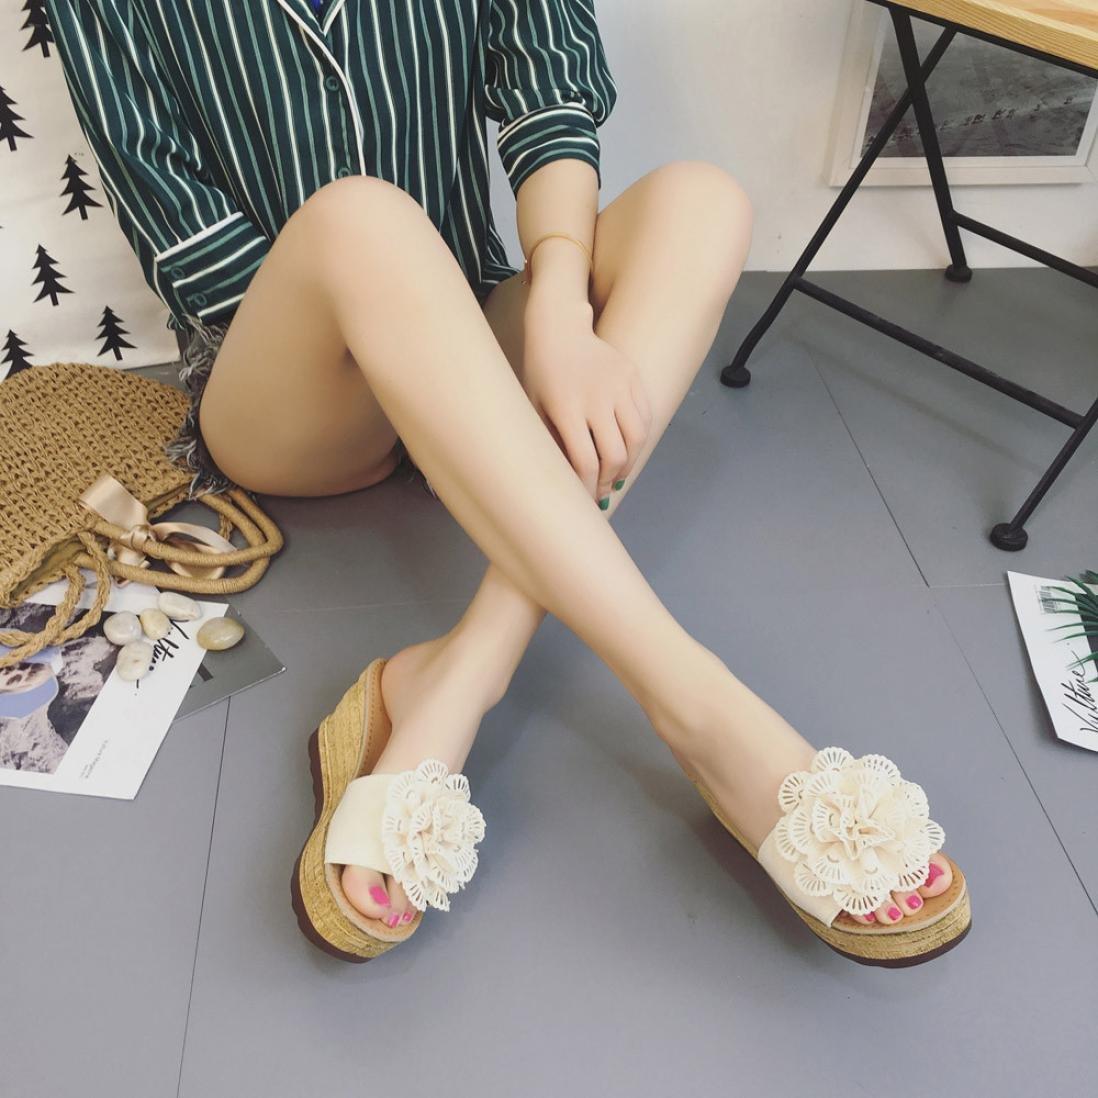 ed2be628d Amazon.com  DENER Women Ladies Summer Wedge Slippers